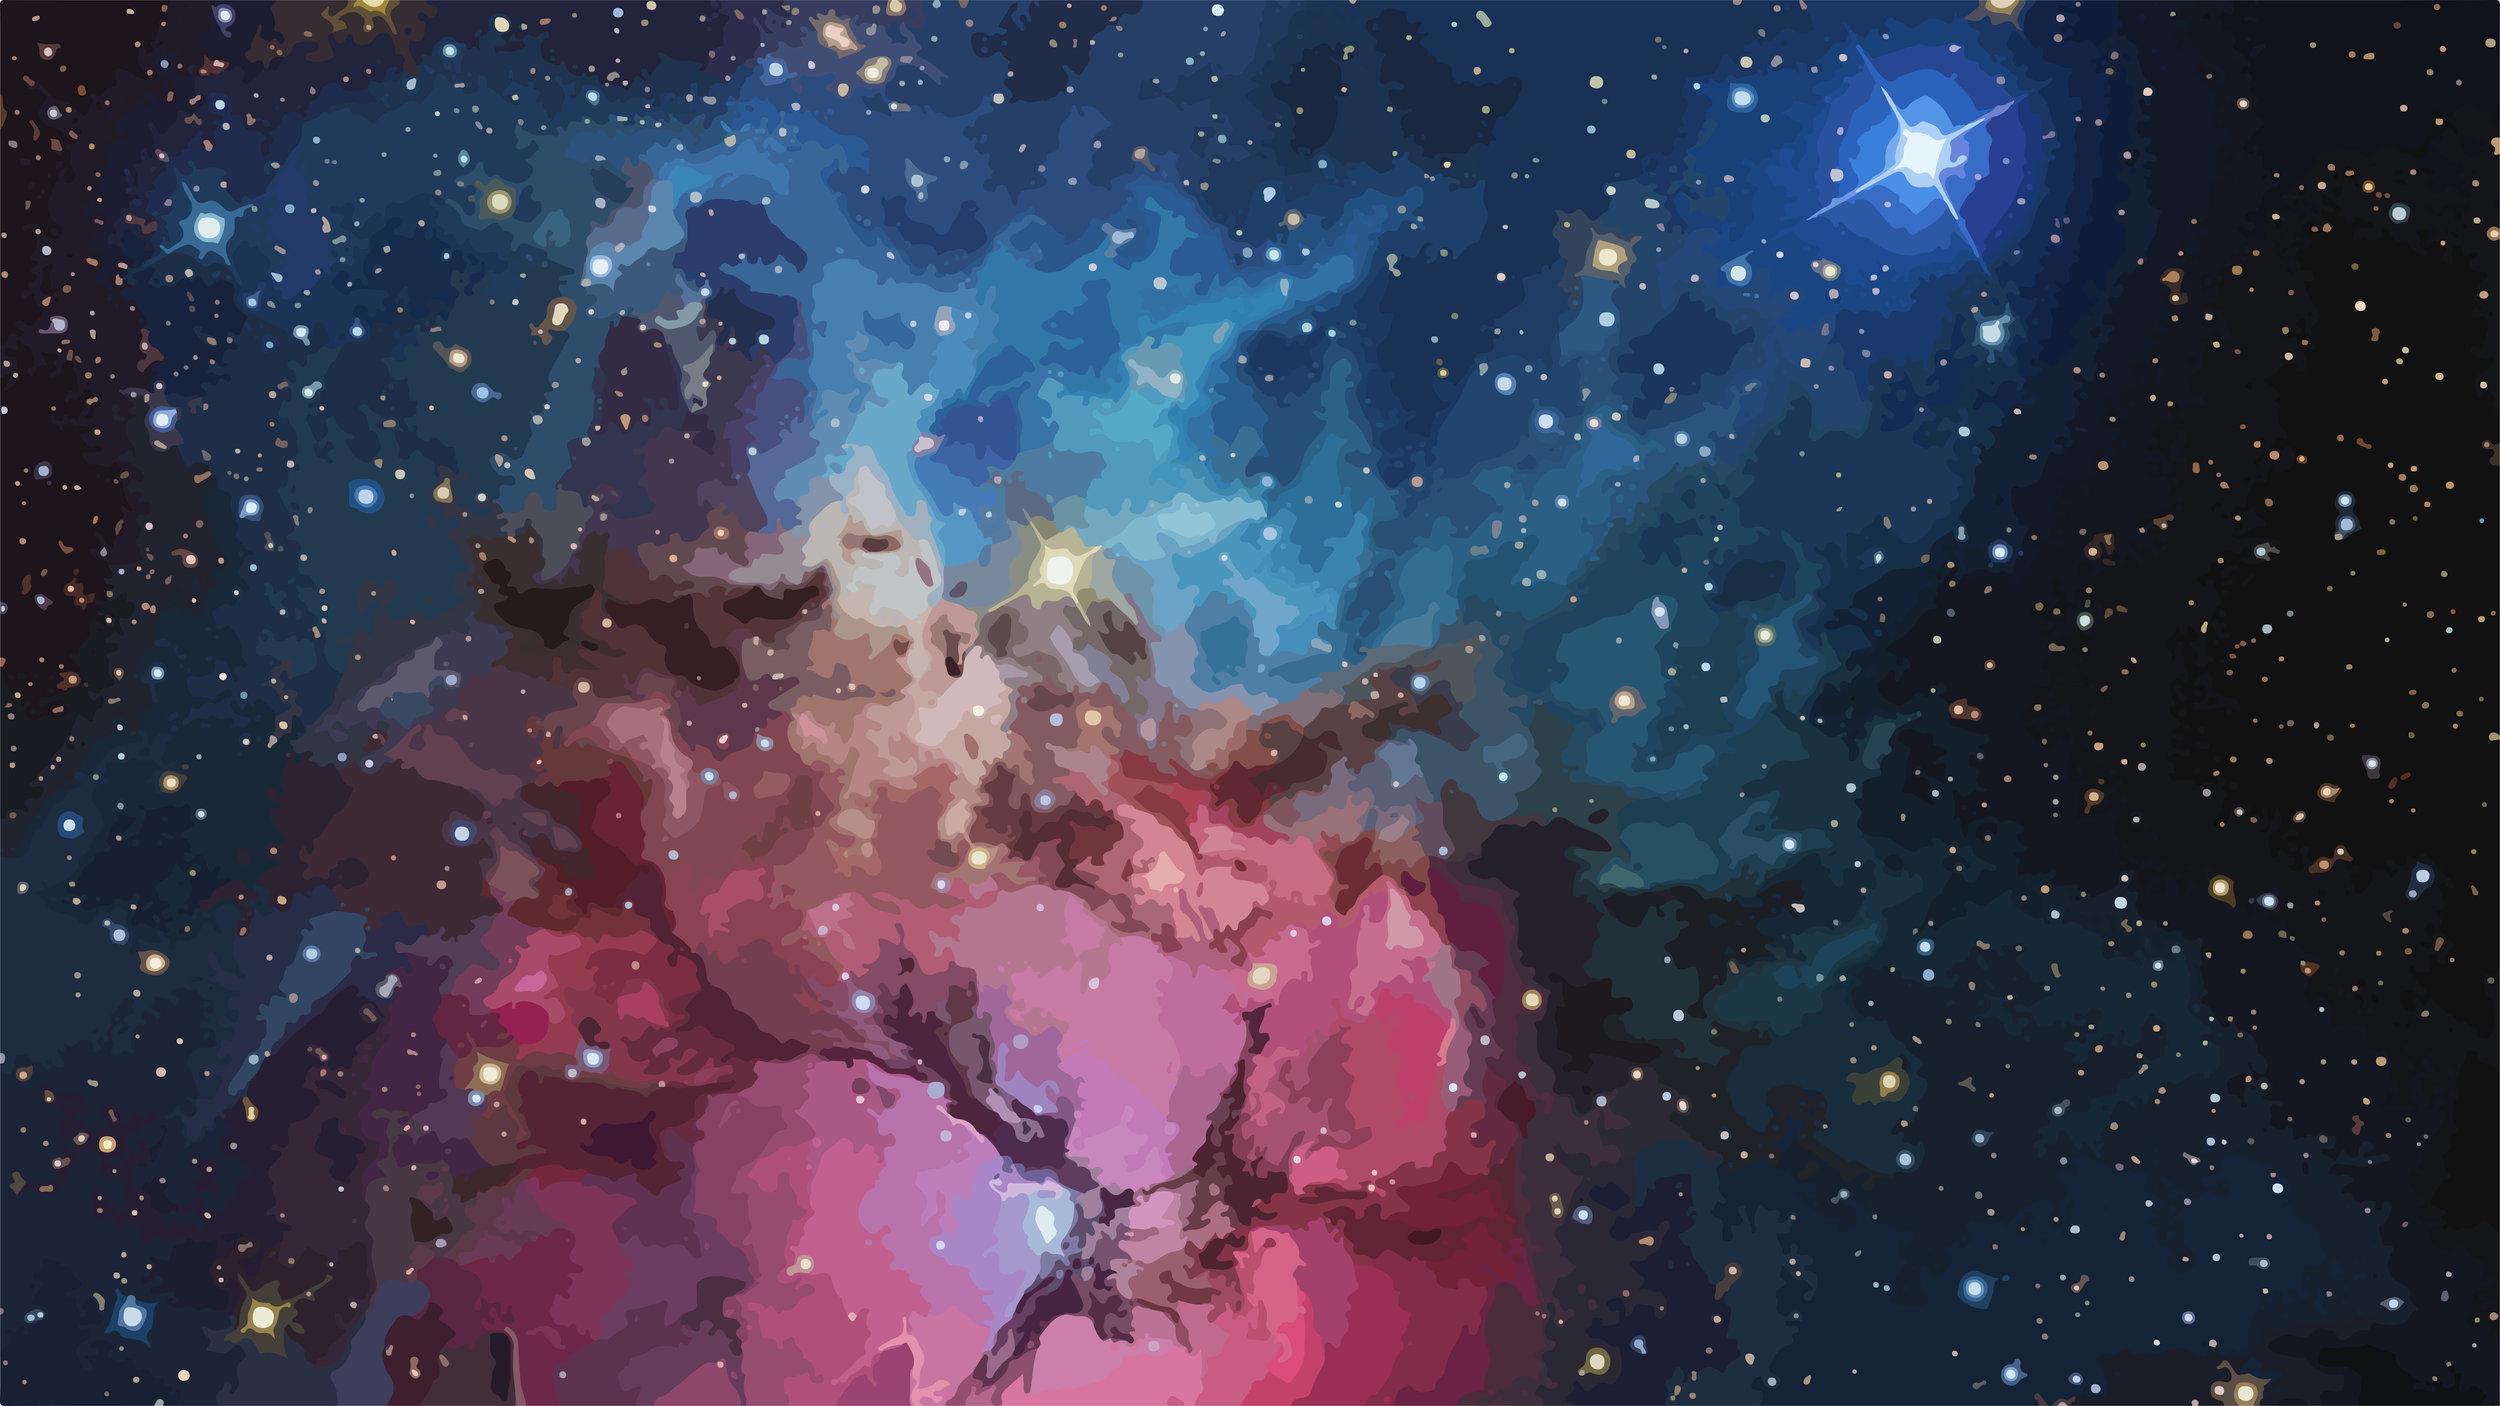 nasa-space-pictures-hubble-wallpaper-2.jpg